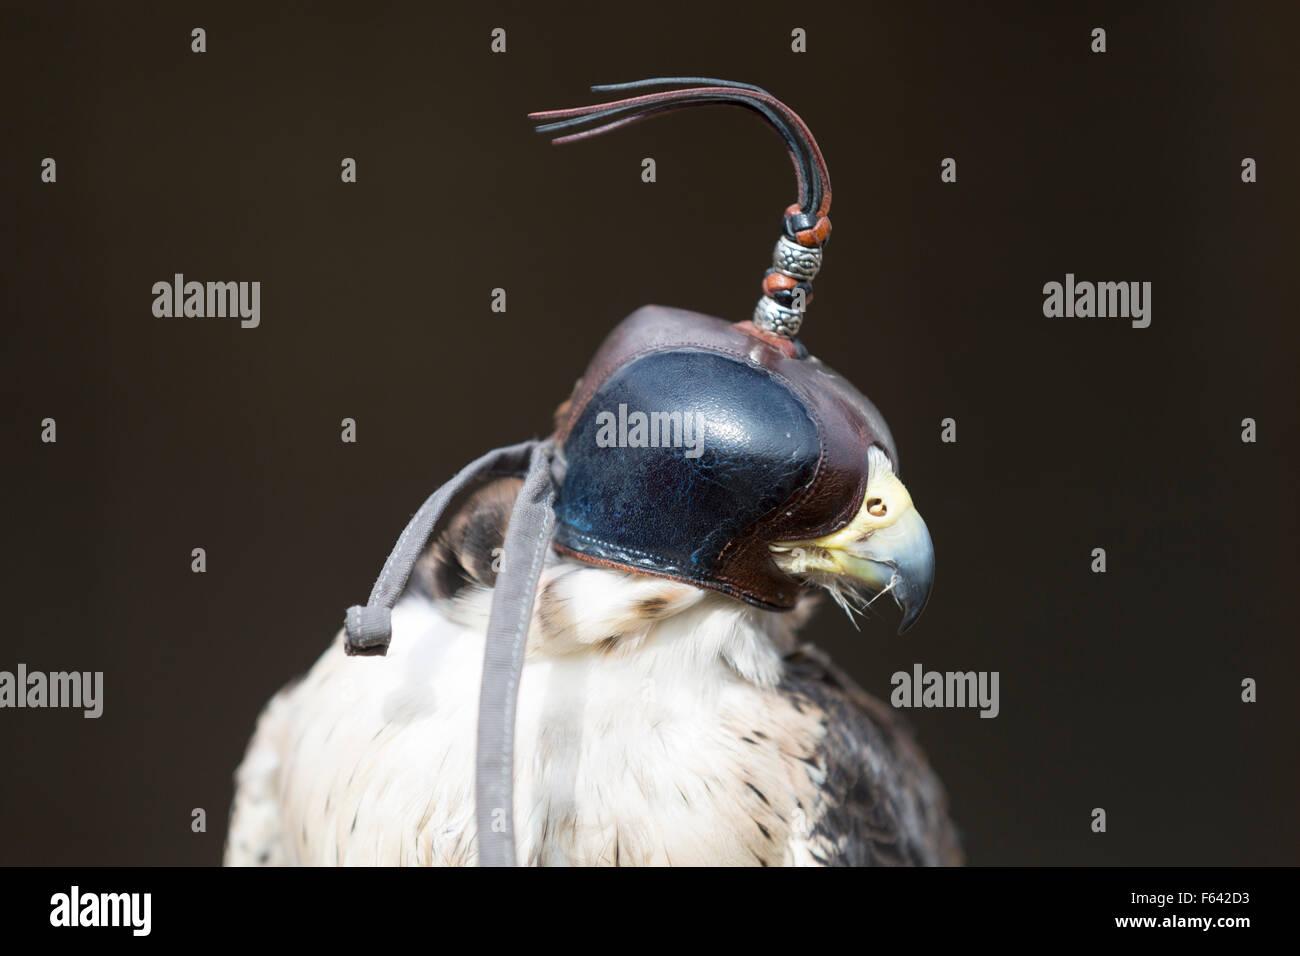 Wildlife : European Kestrel (Falco tinnunculus), bird of prey. Aka Eurasian Kestrel or Old World Kestrel - Stock Image